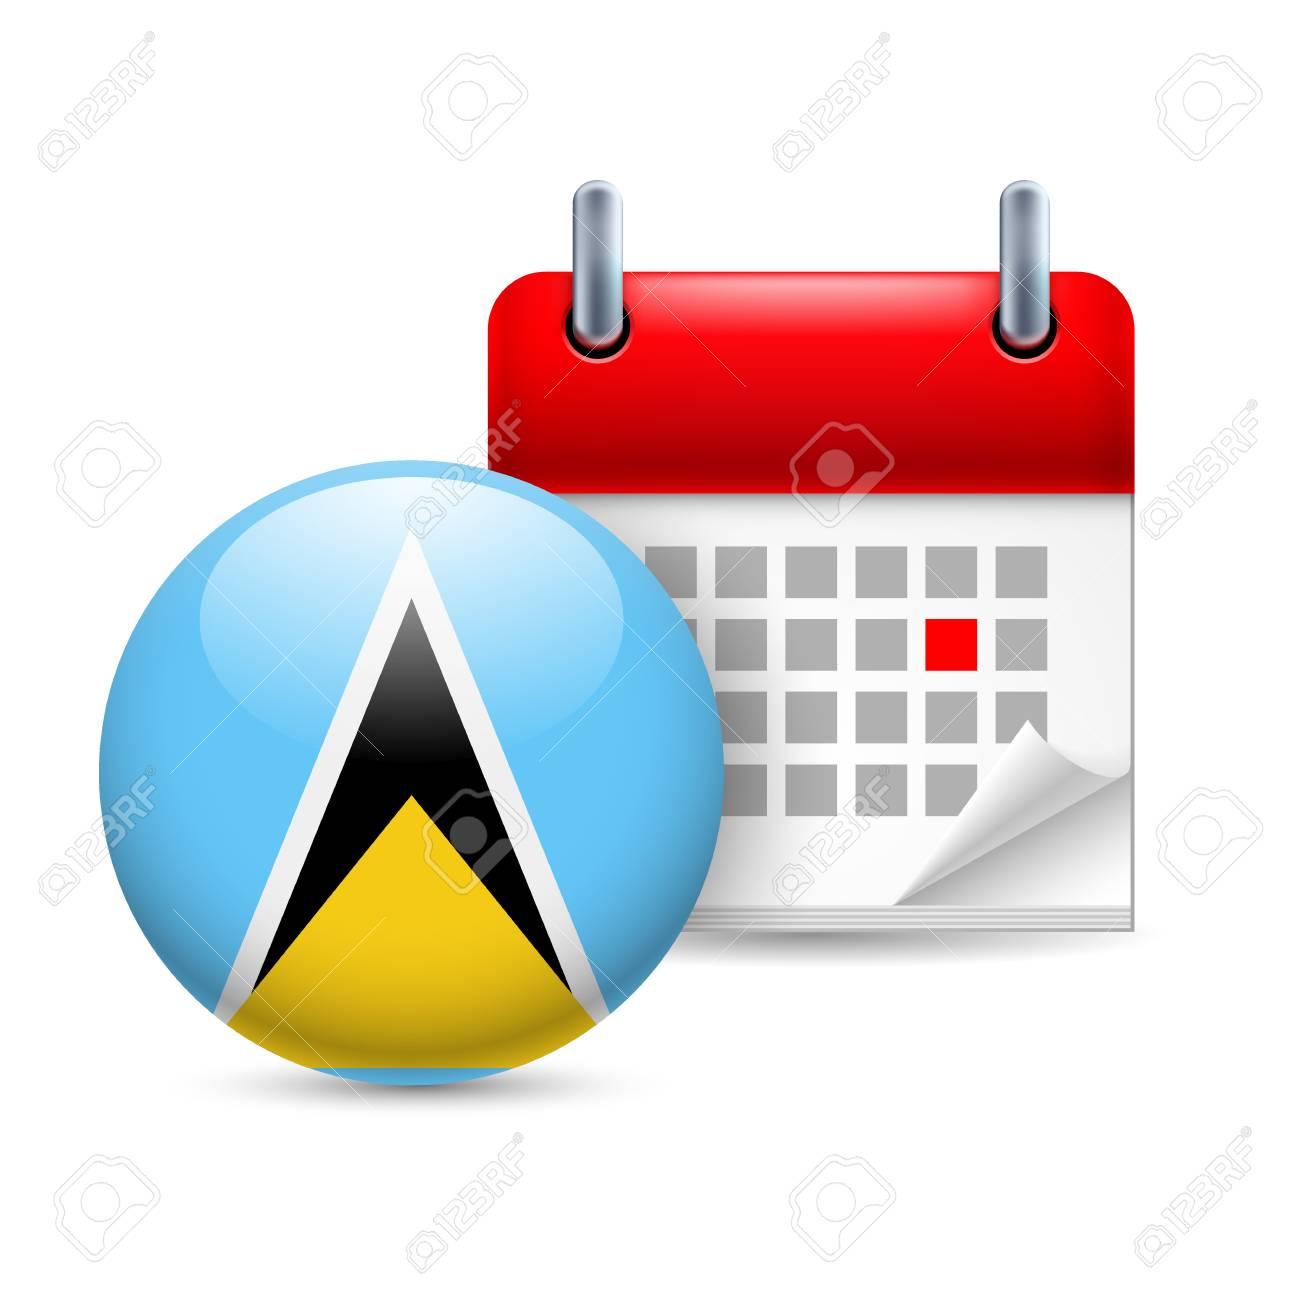 Santa Lucia Calendario.Calendario Y Icono De Bandera Ronda Fiesta Nacional En Santa Lucia